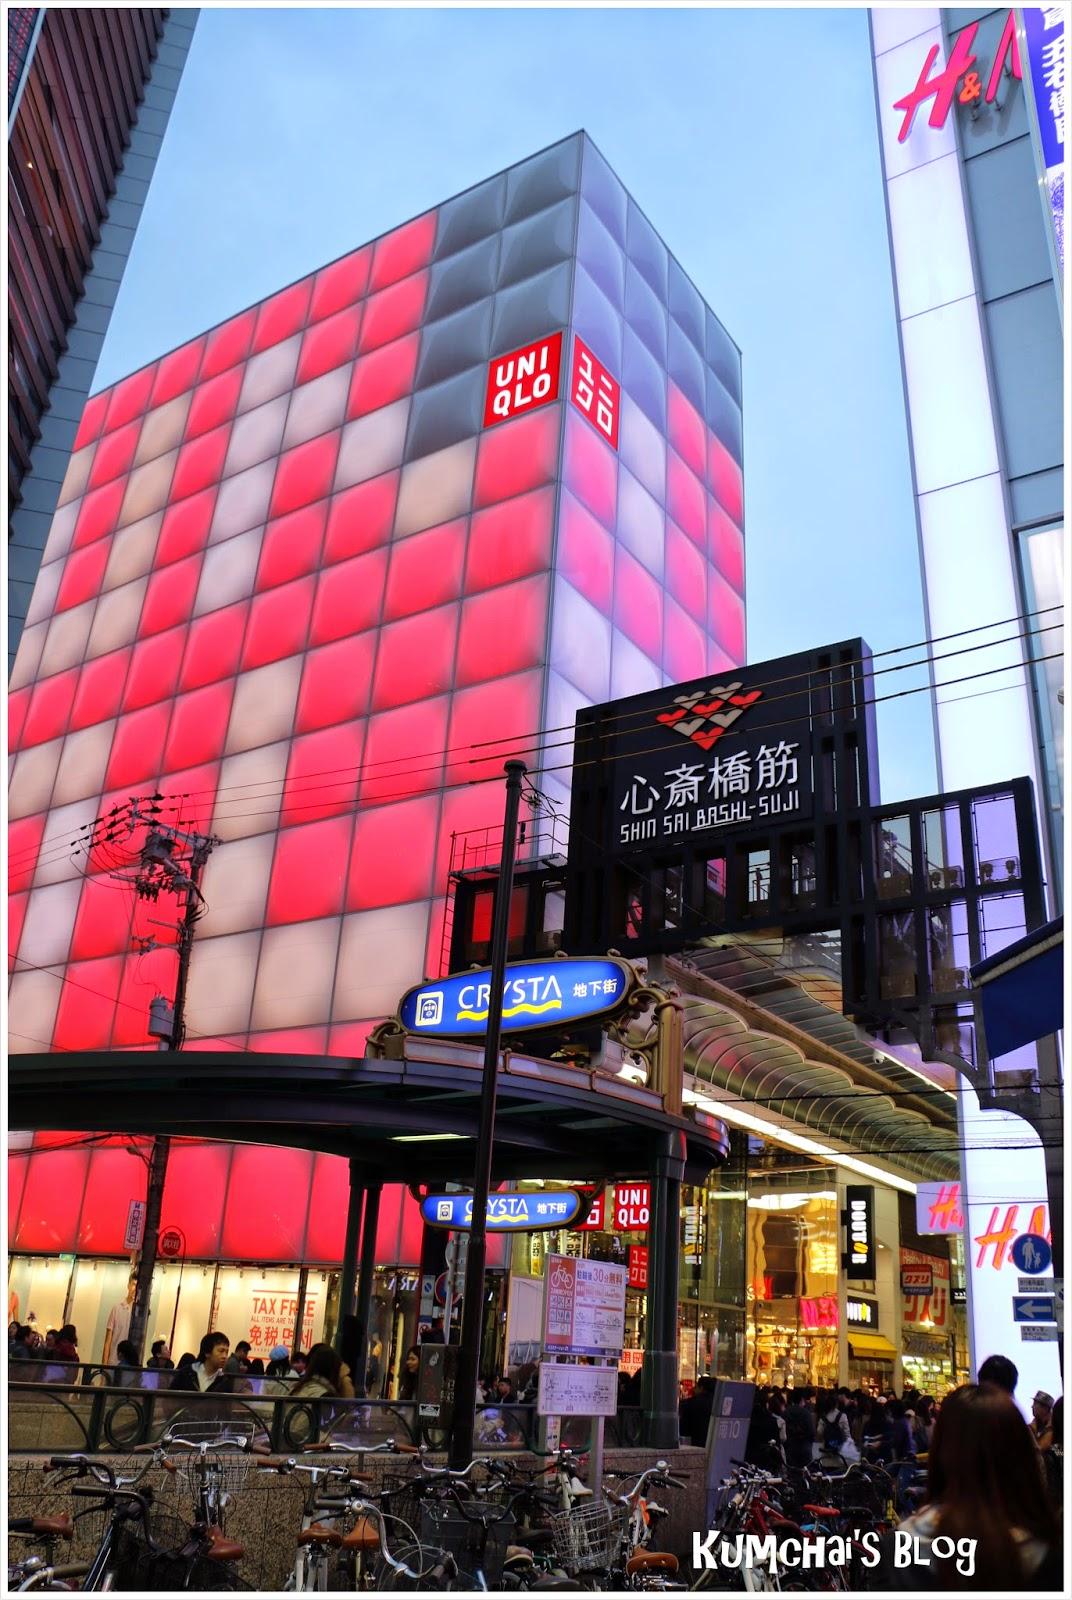 Kumchai Blog: 2015-03-22 京阪自由行 (梅田 大阪)